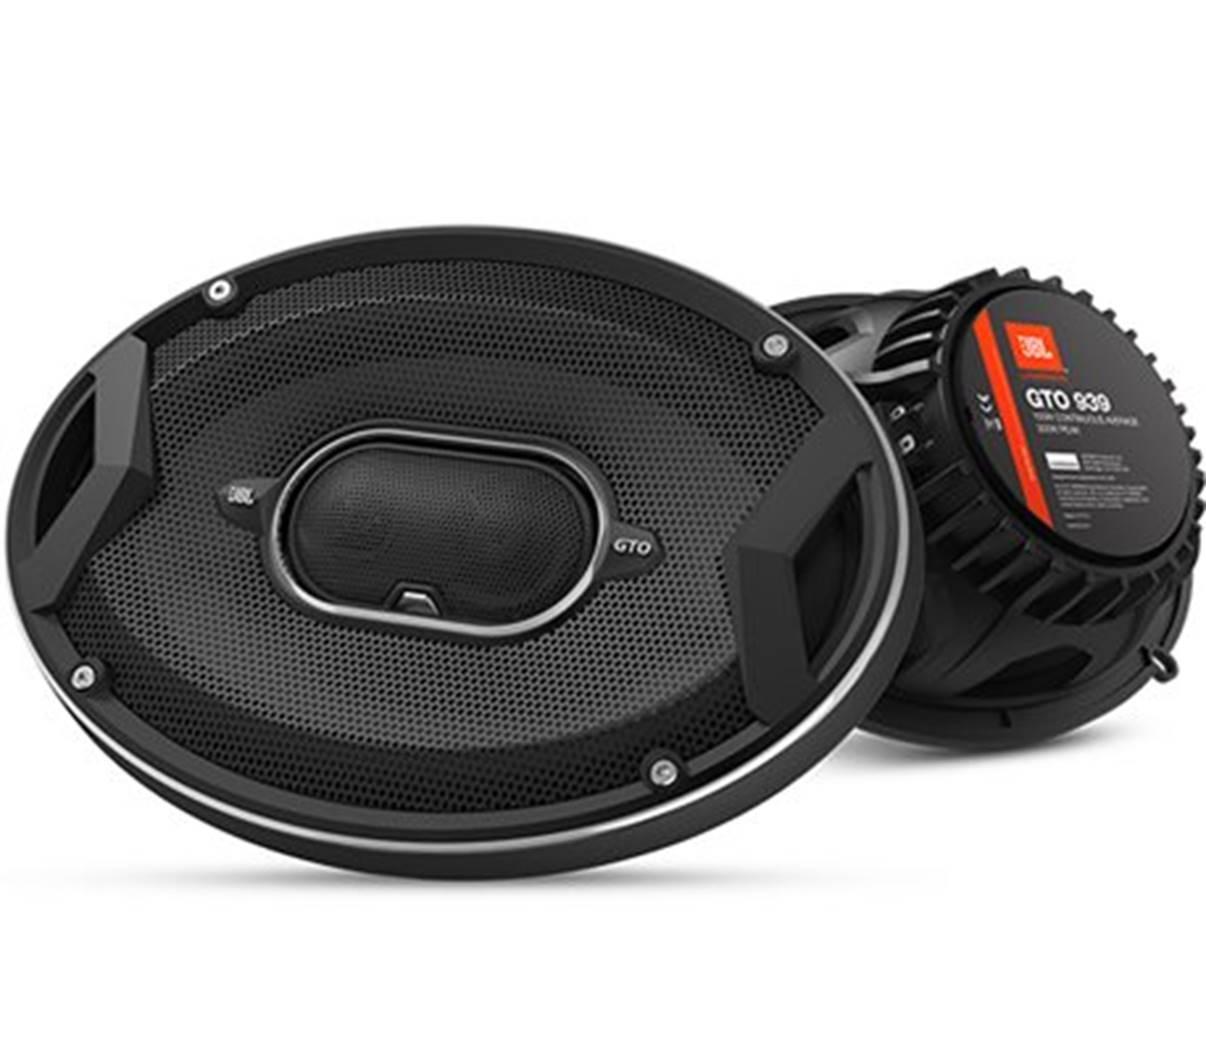 JBL GTO939 GTO Car Coaxial Speakers